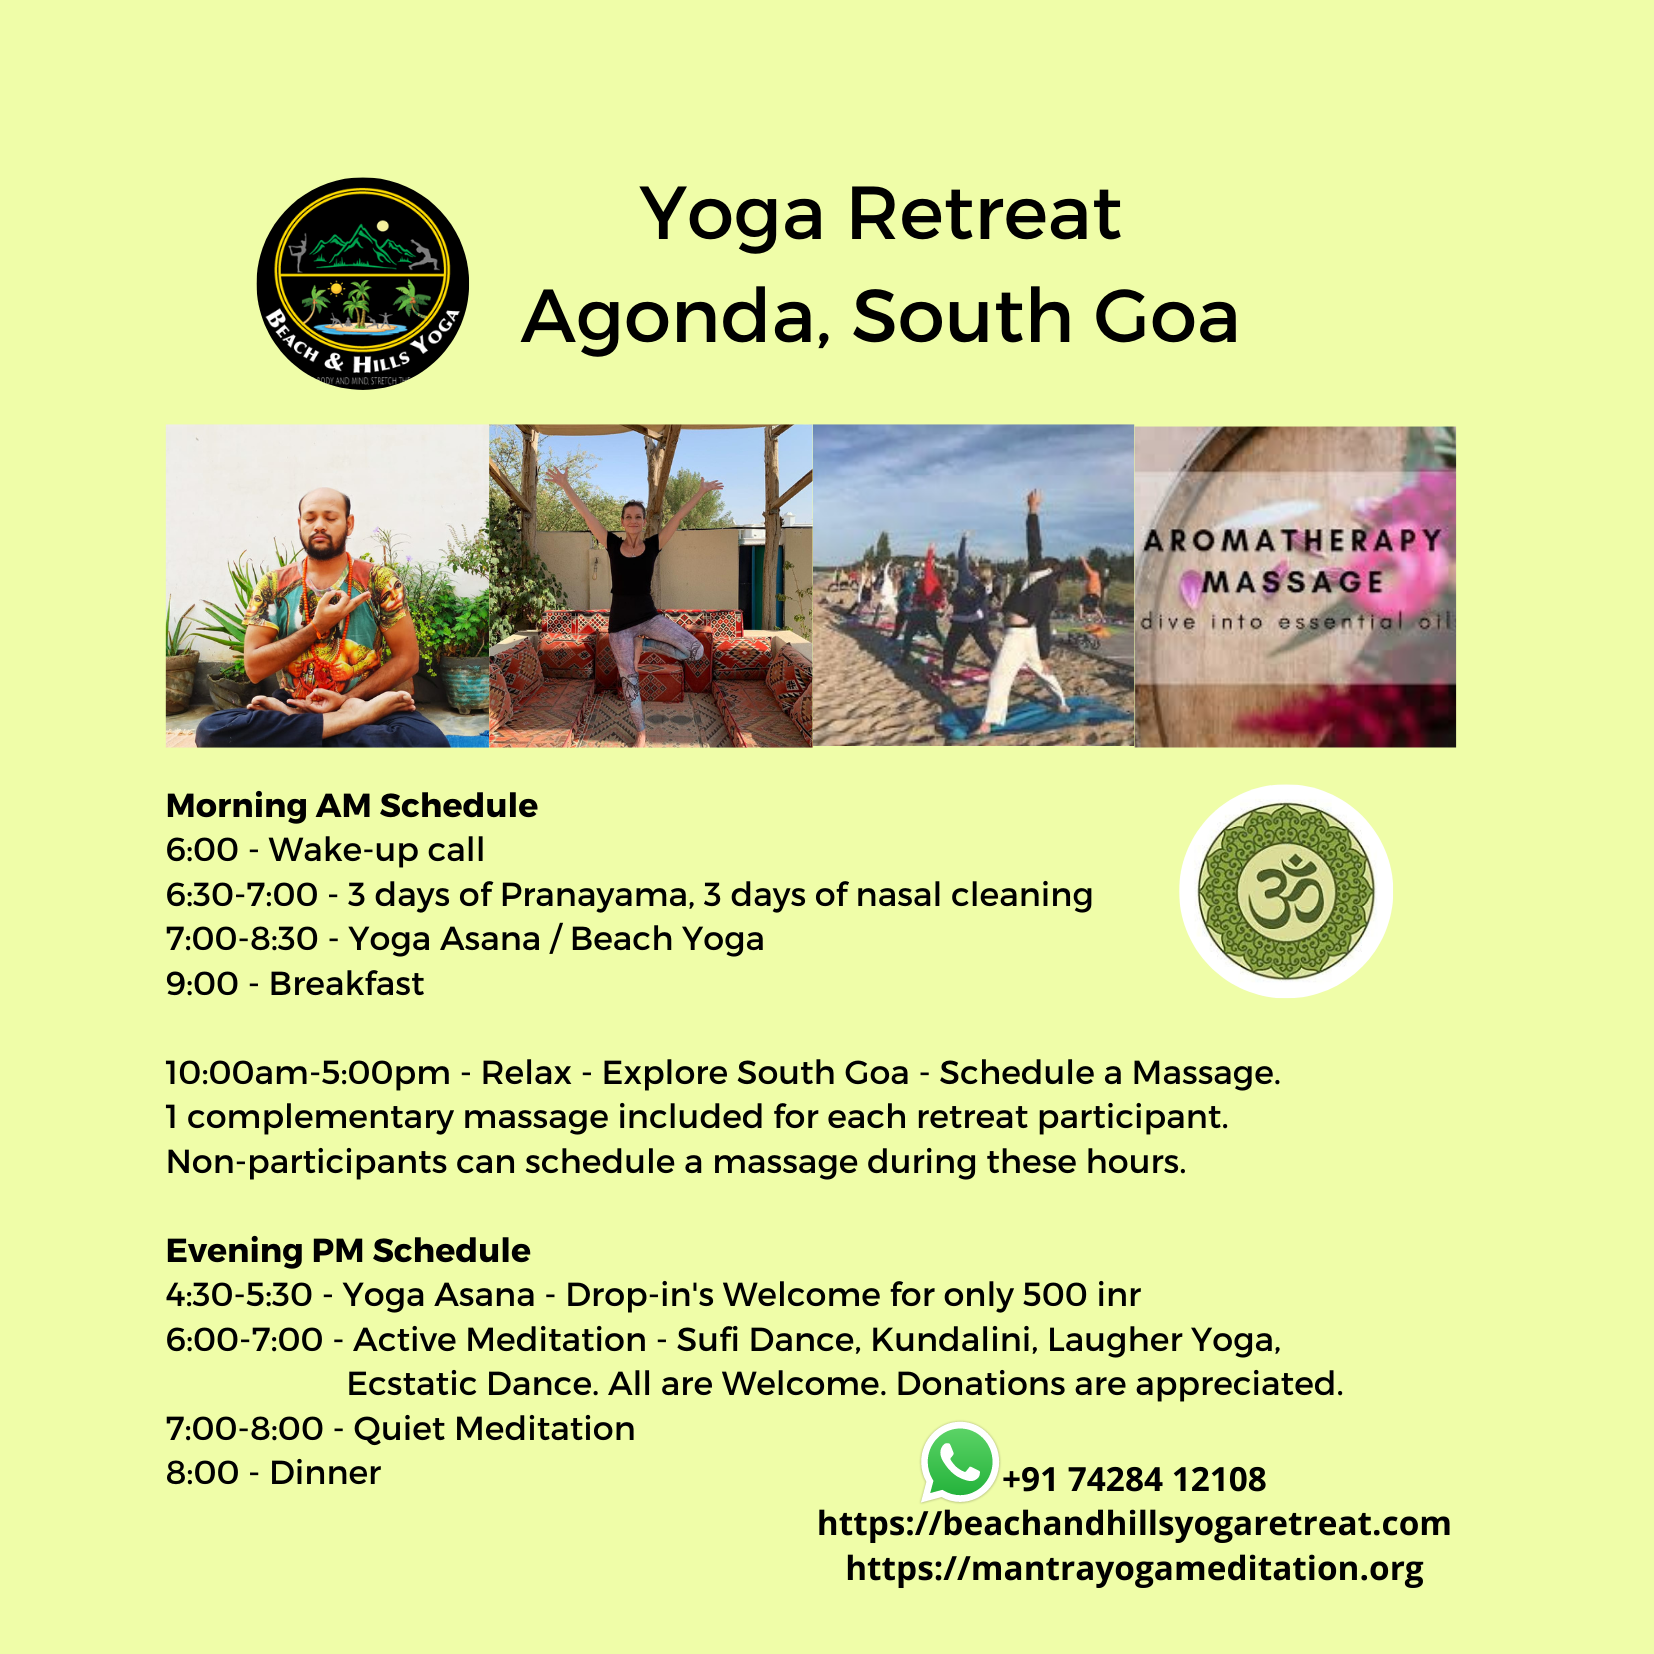 Yoga-Retreat-Beach-and-Hills-Yoga-Rereat-Goa Yoga Retreat Goa